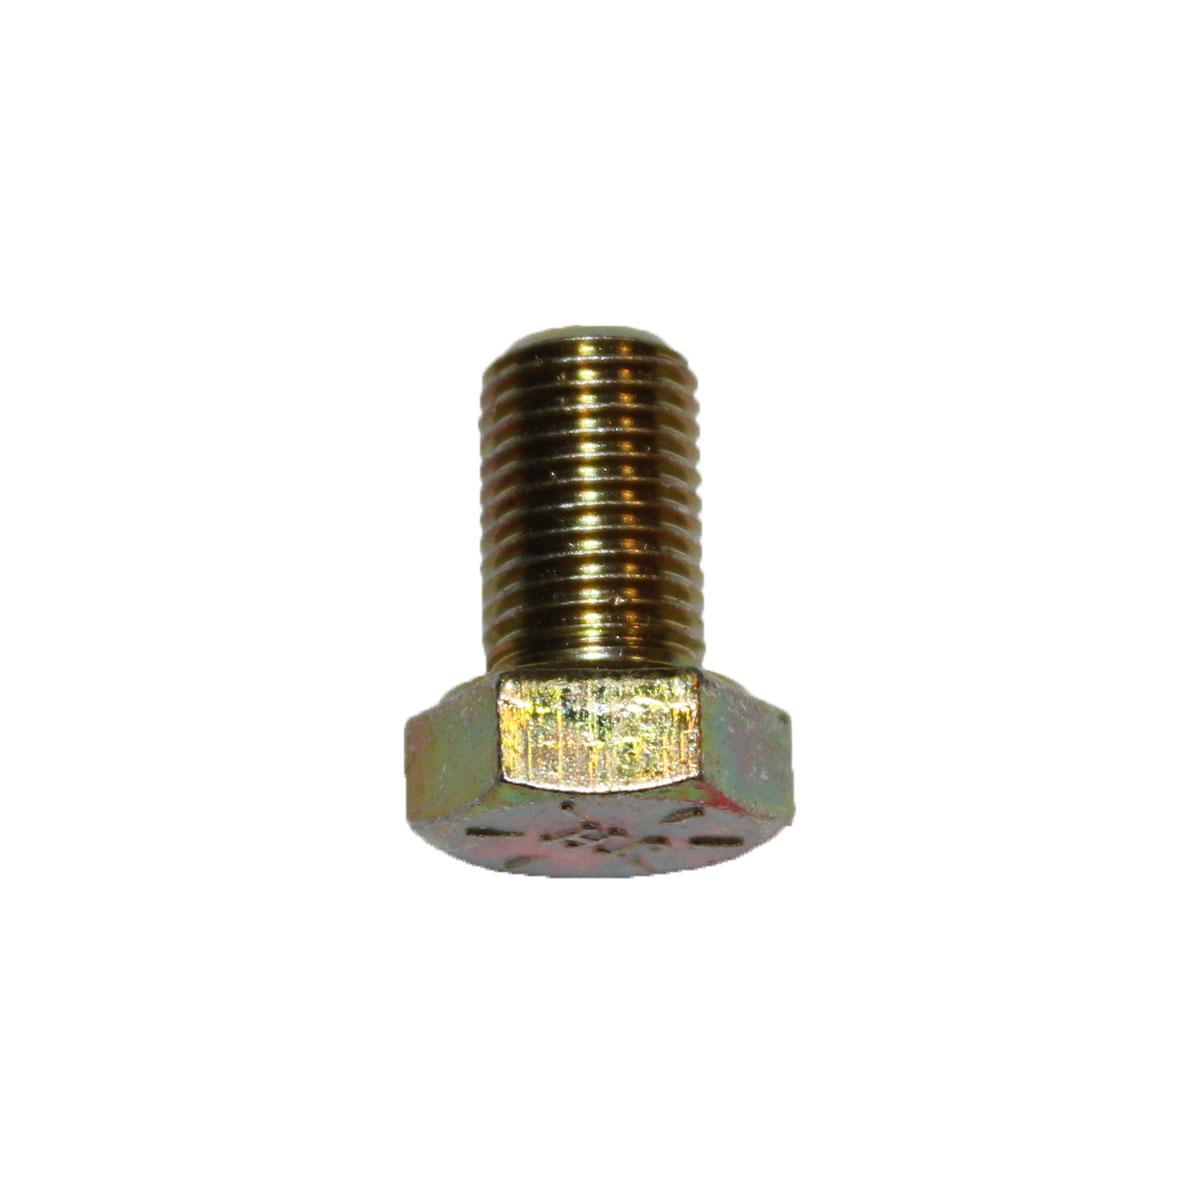 Akkupack für  BPS12S491708  Festo Festool  12V 1600mAh Ni-MH zum Selbsteinbau